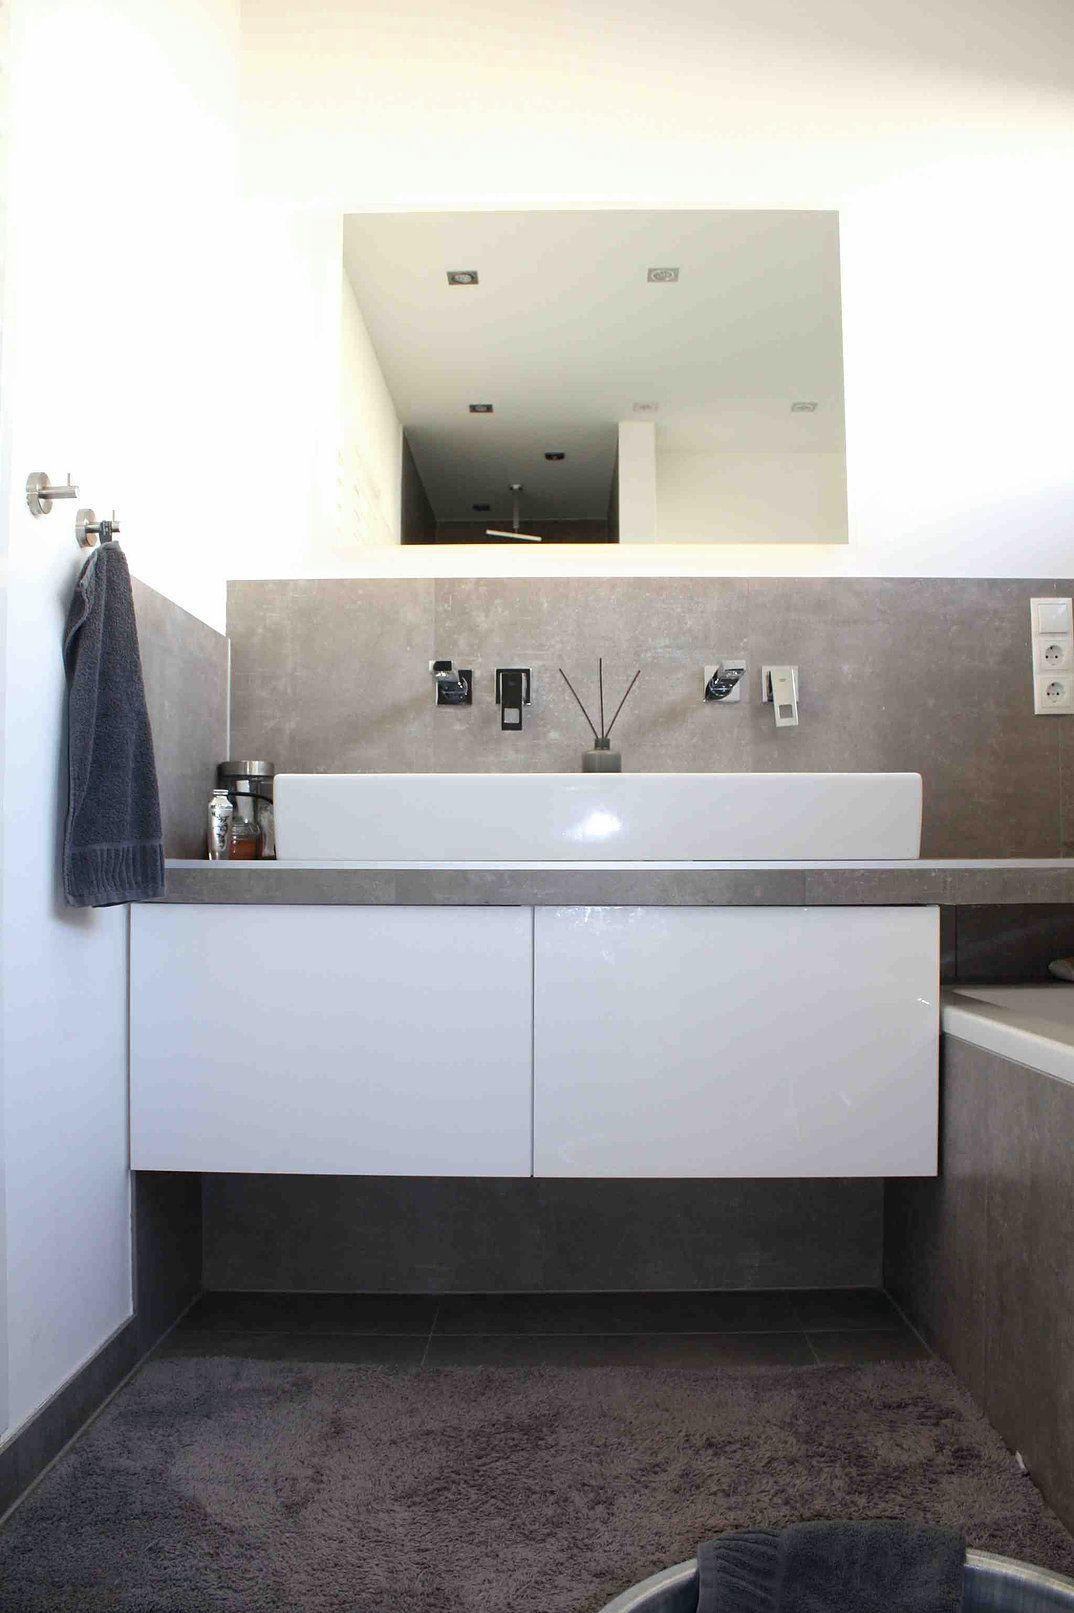 Ein Kuchenschrank Im Badezimmer Bad Umbau Mit Ikea Metod Hack Mimimia Schoene Sachen Selber Mache Ikea Bad Unterschrank Badezimmer Mobel Badezimmer Umbau